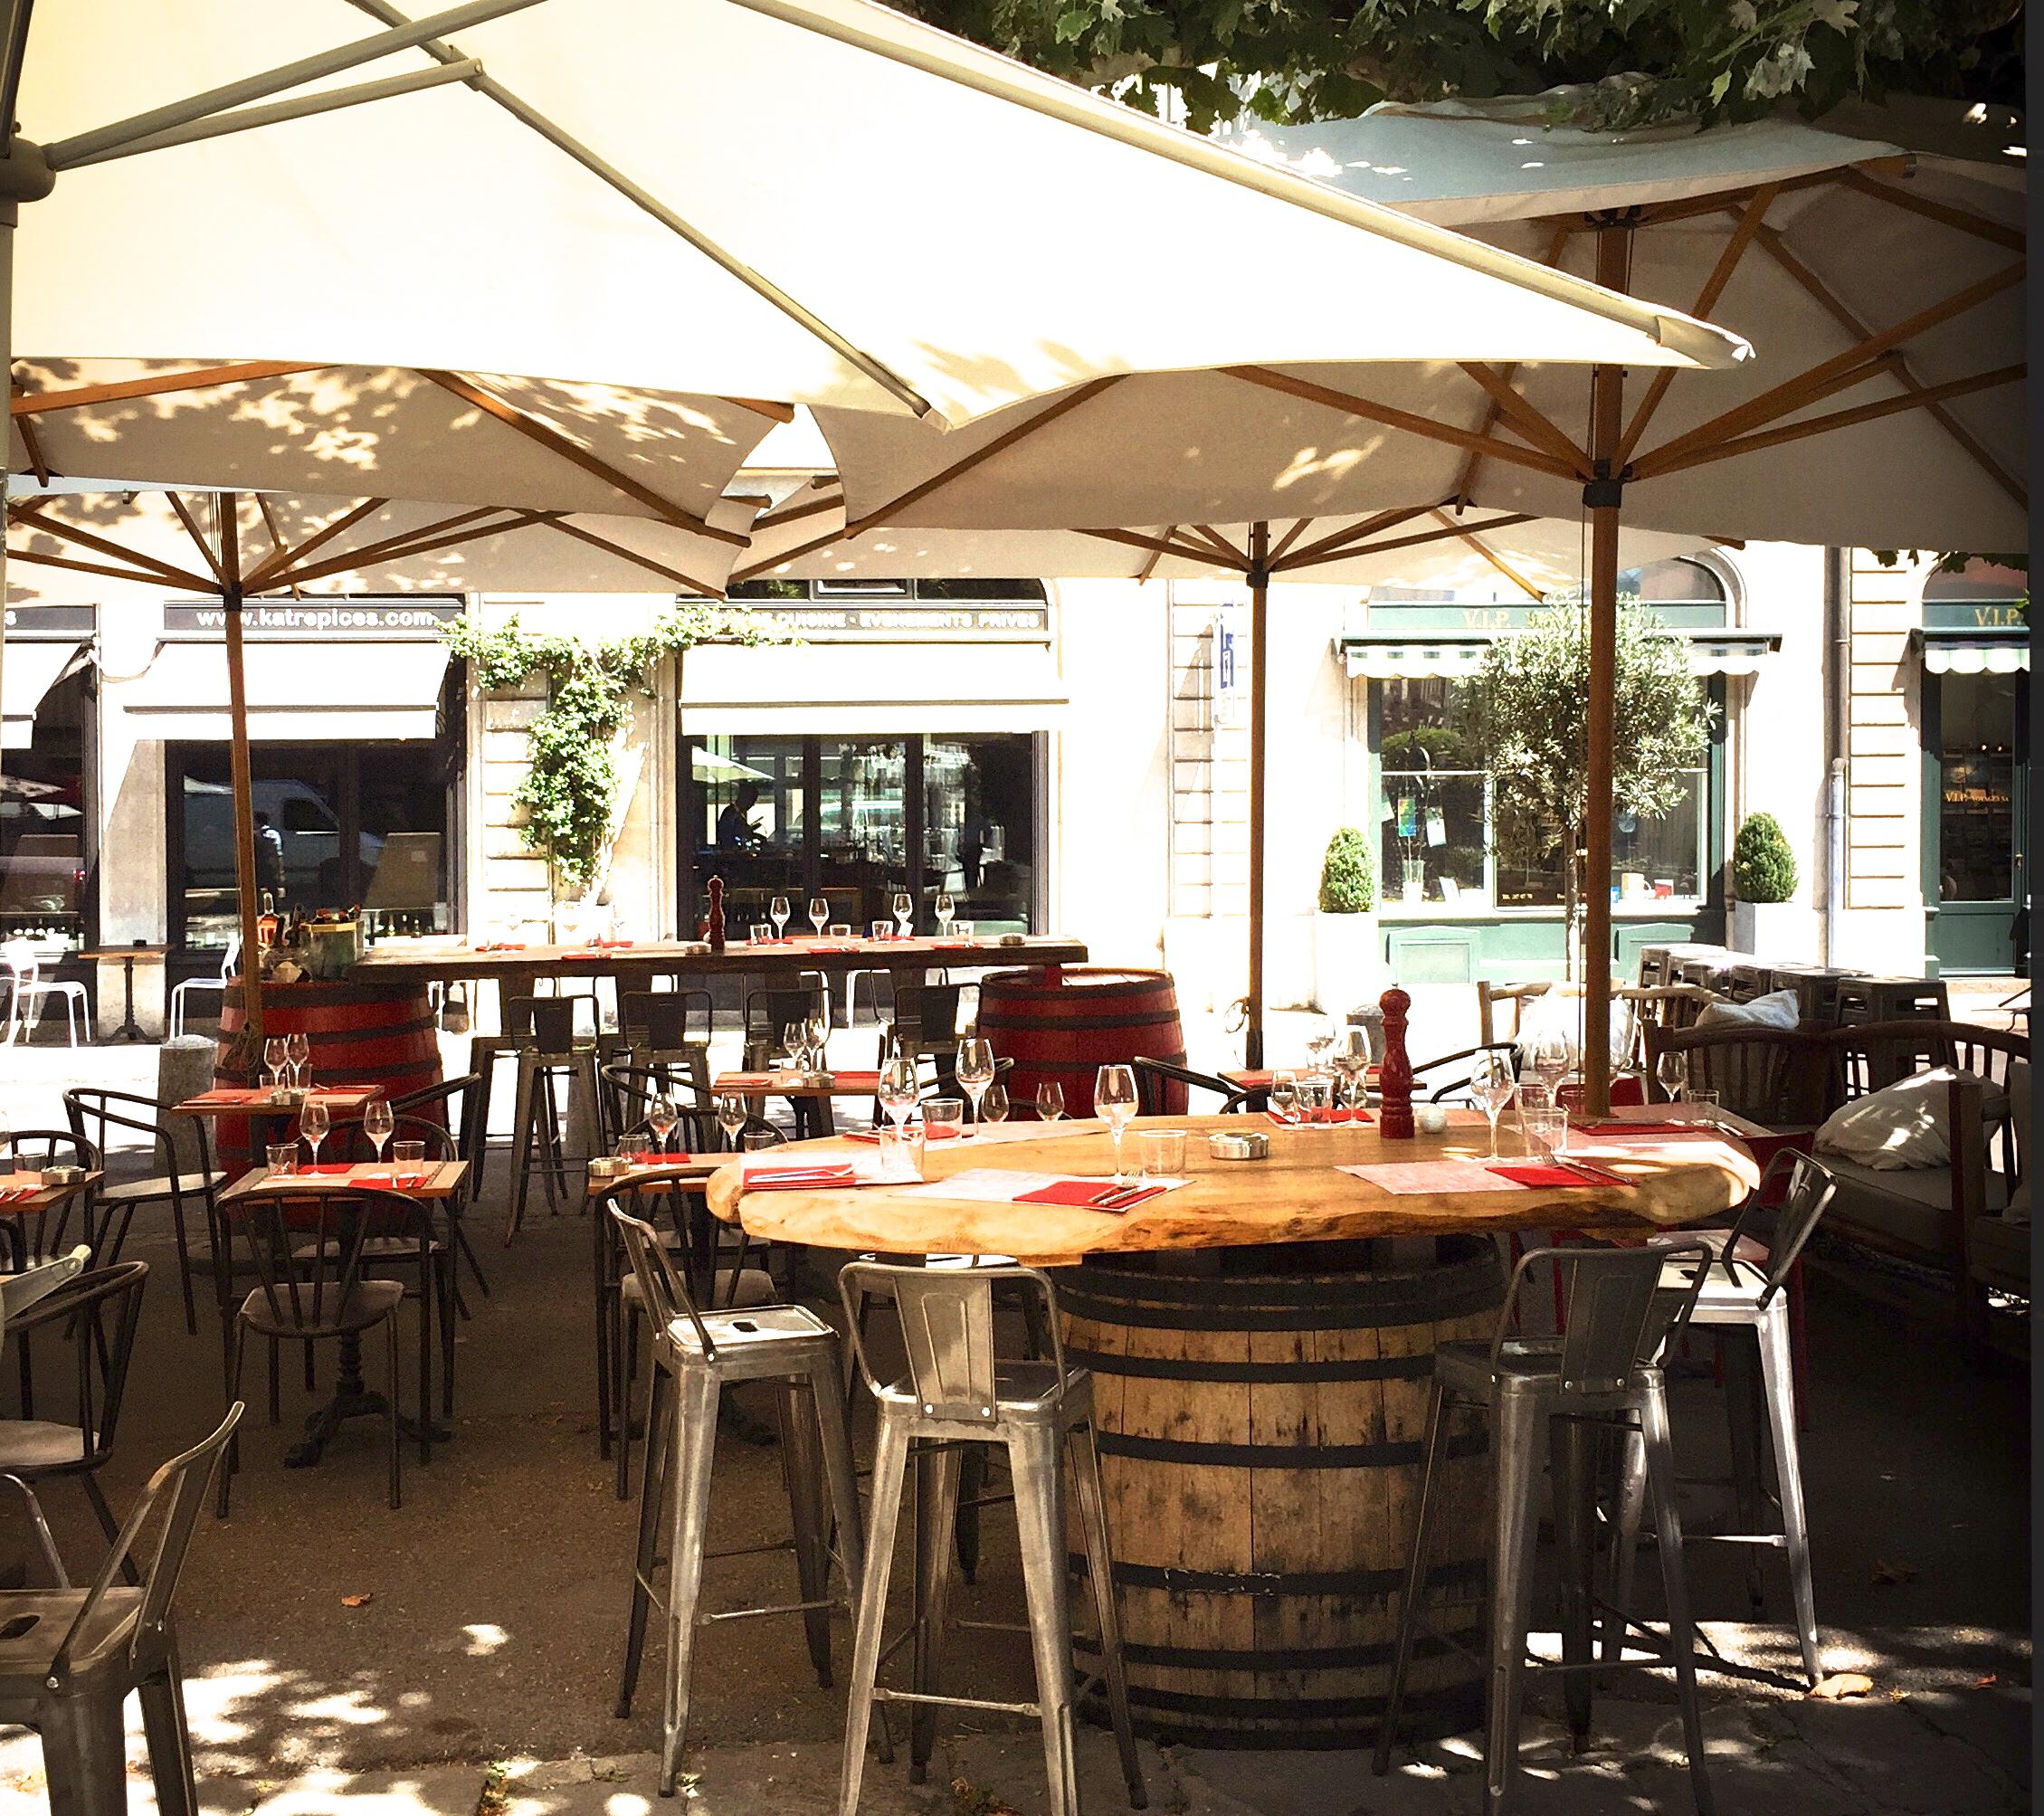 katrepices-restaurant-geneve-platdujou-coursdecuisine-baravin14.JPG